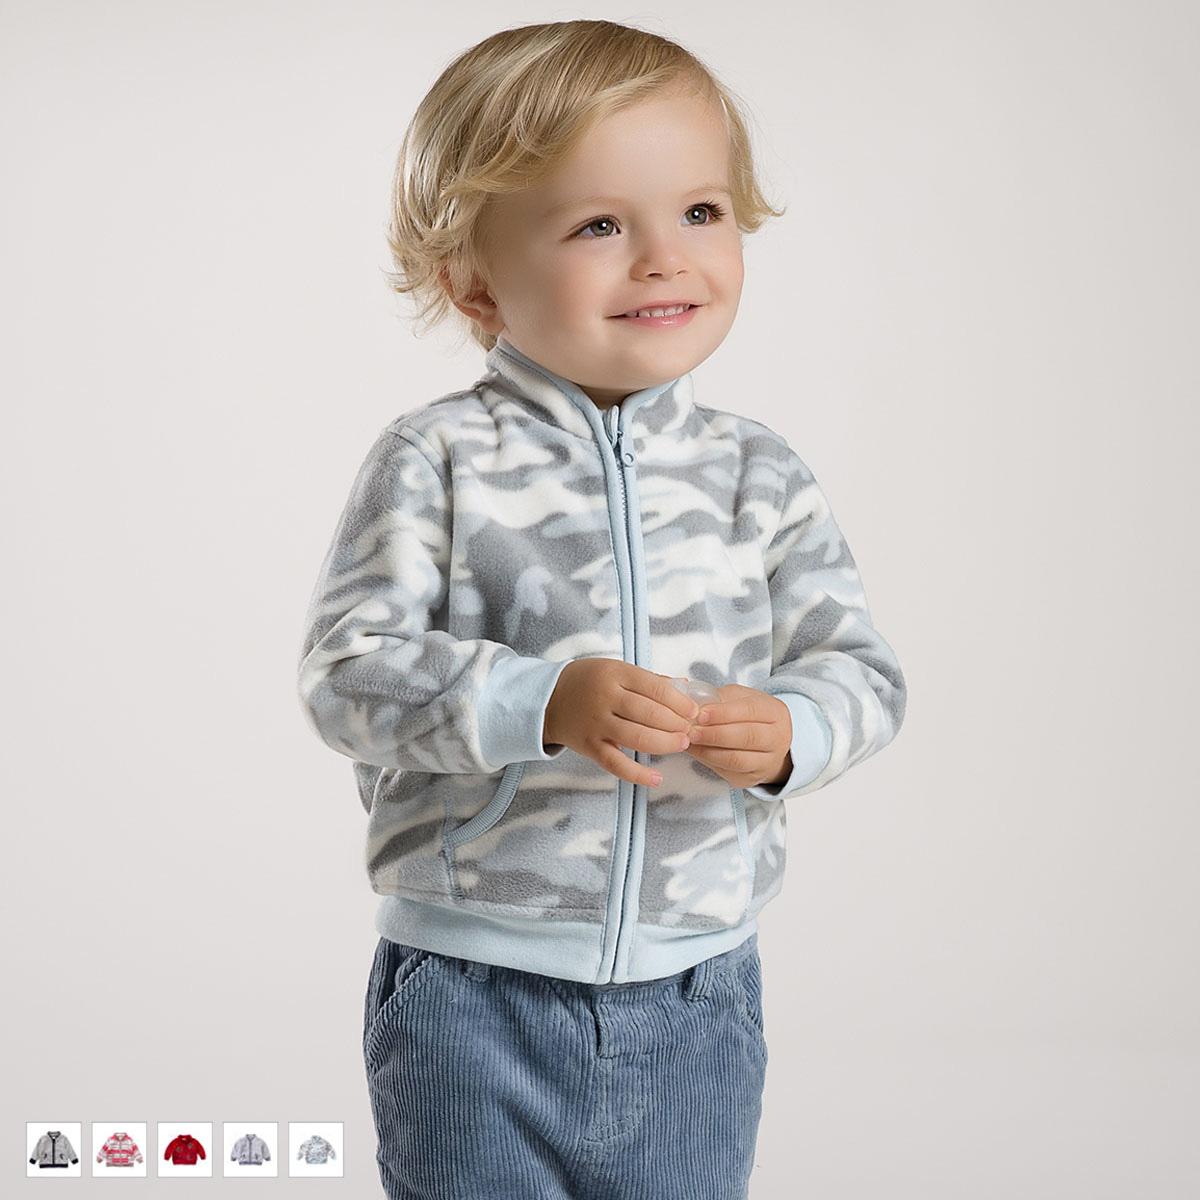 davebella戴維貝拉 男童 外套 寶寶拉鏈衫 嬰兒外套 CT